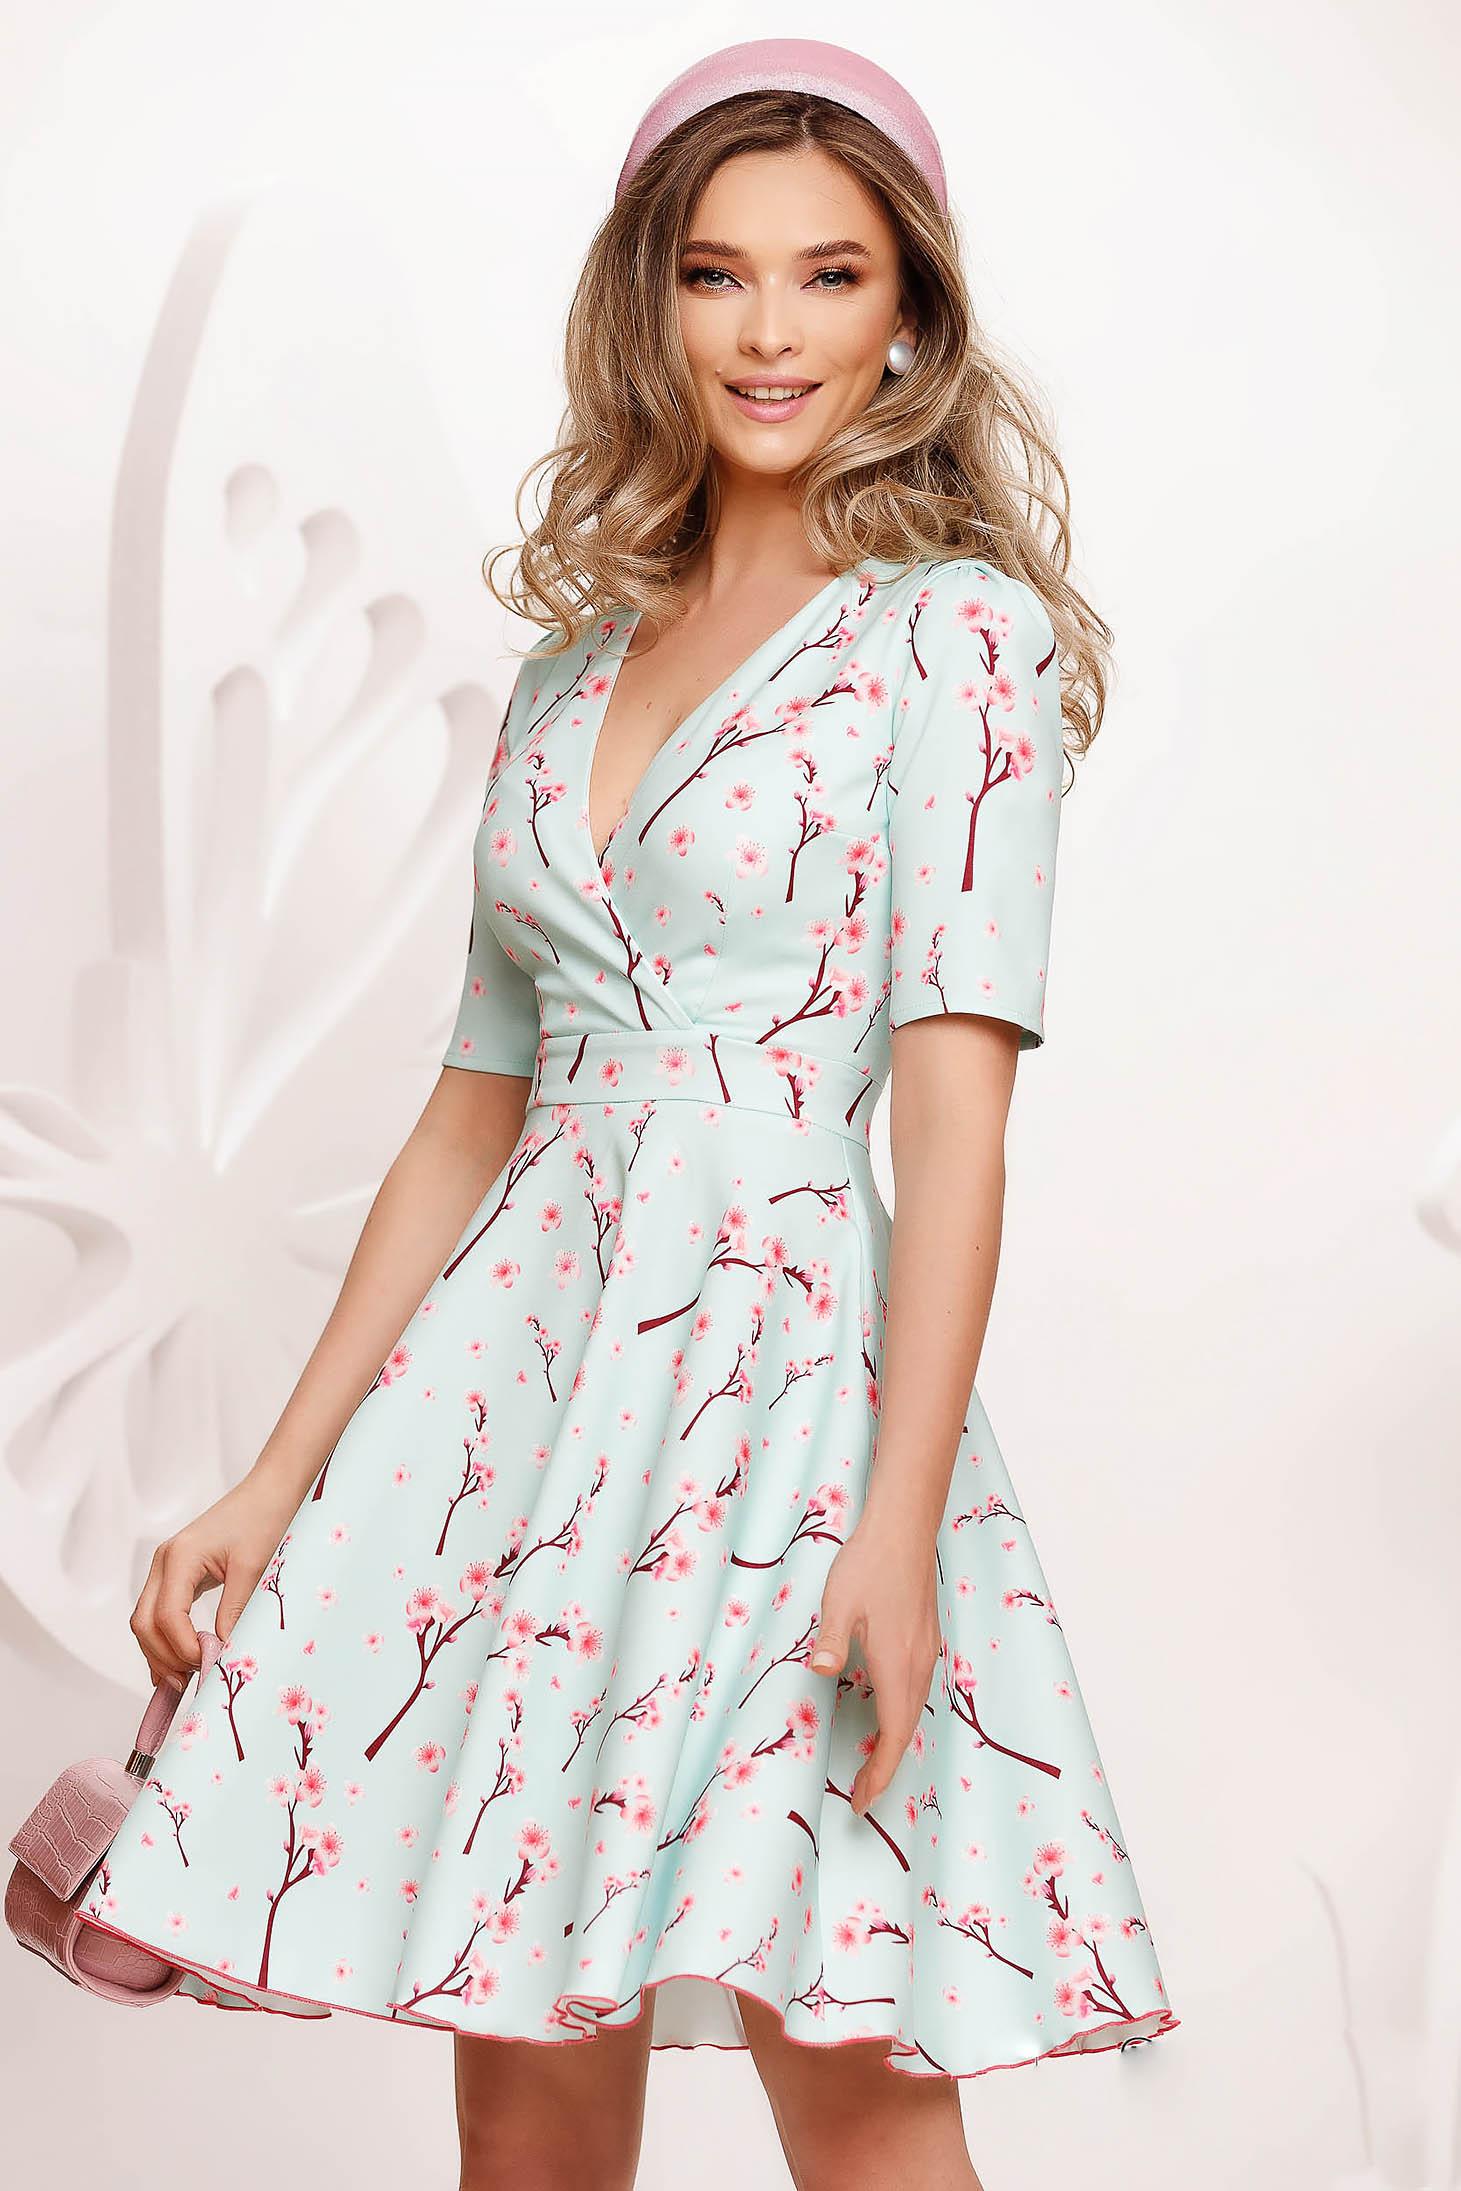 Lightgreen dress cloche slightly elastic fabric midi with v-neckline